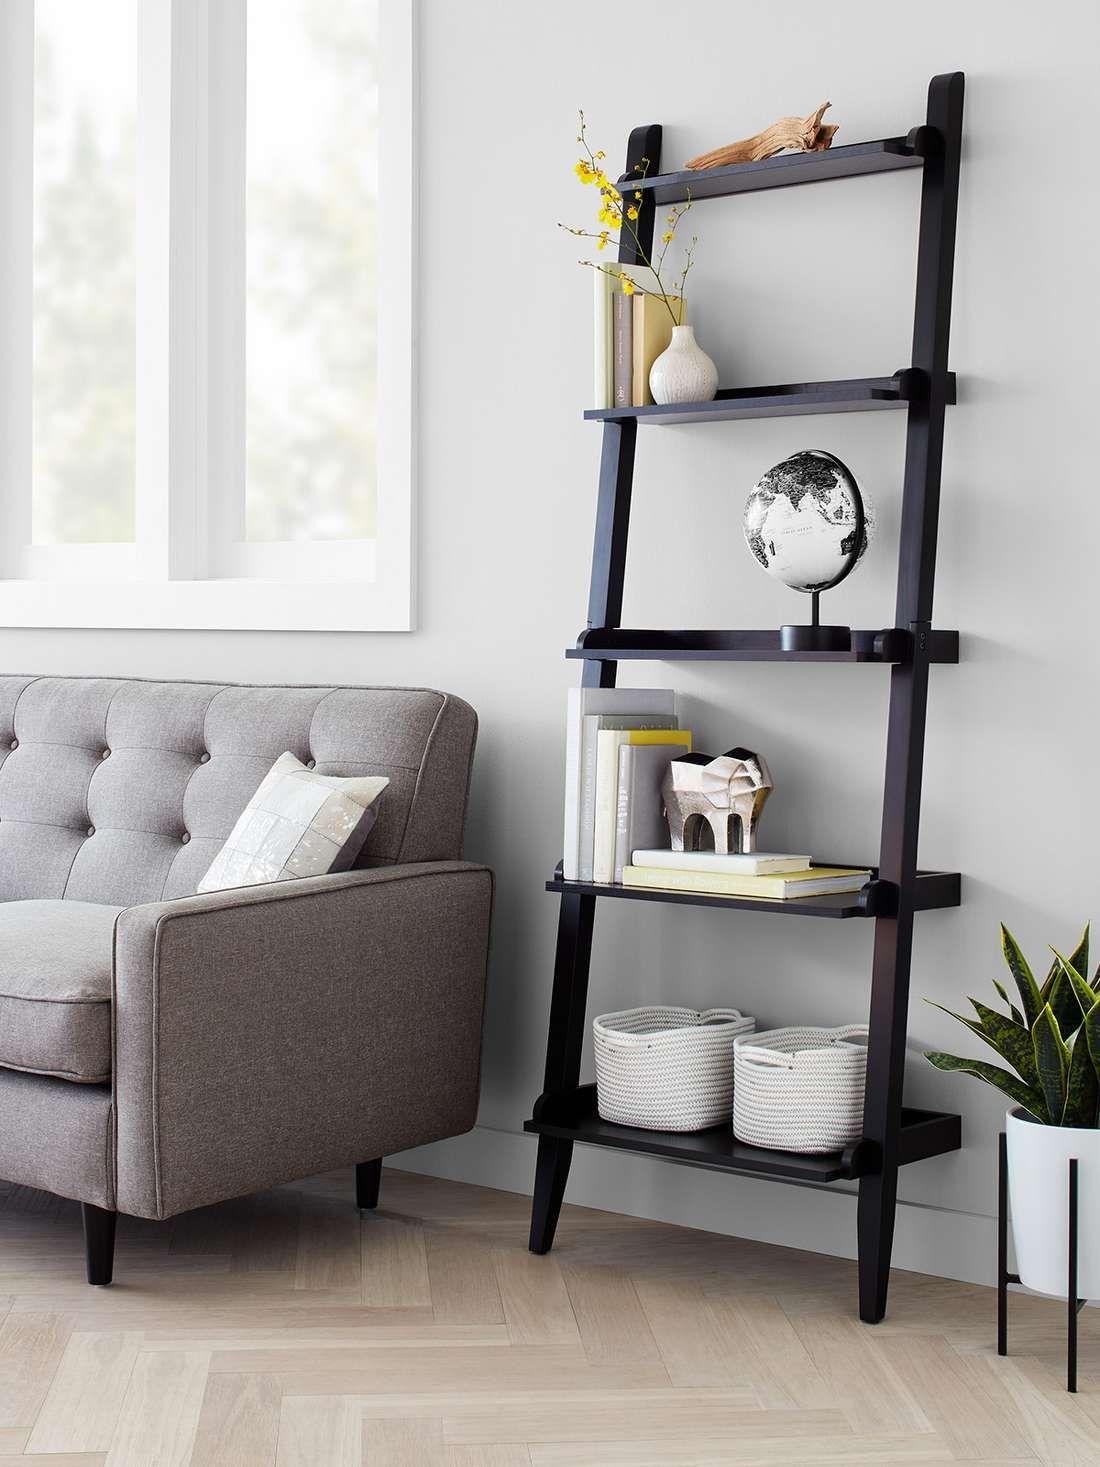 Shop bookshelves & bookcases at Target. Find a wide